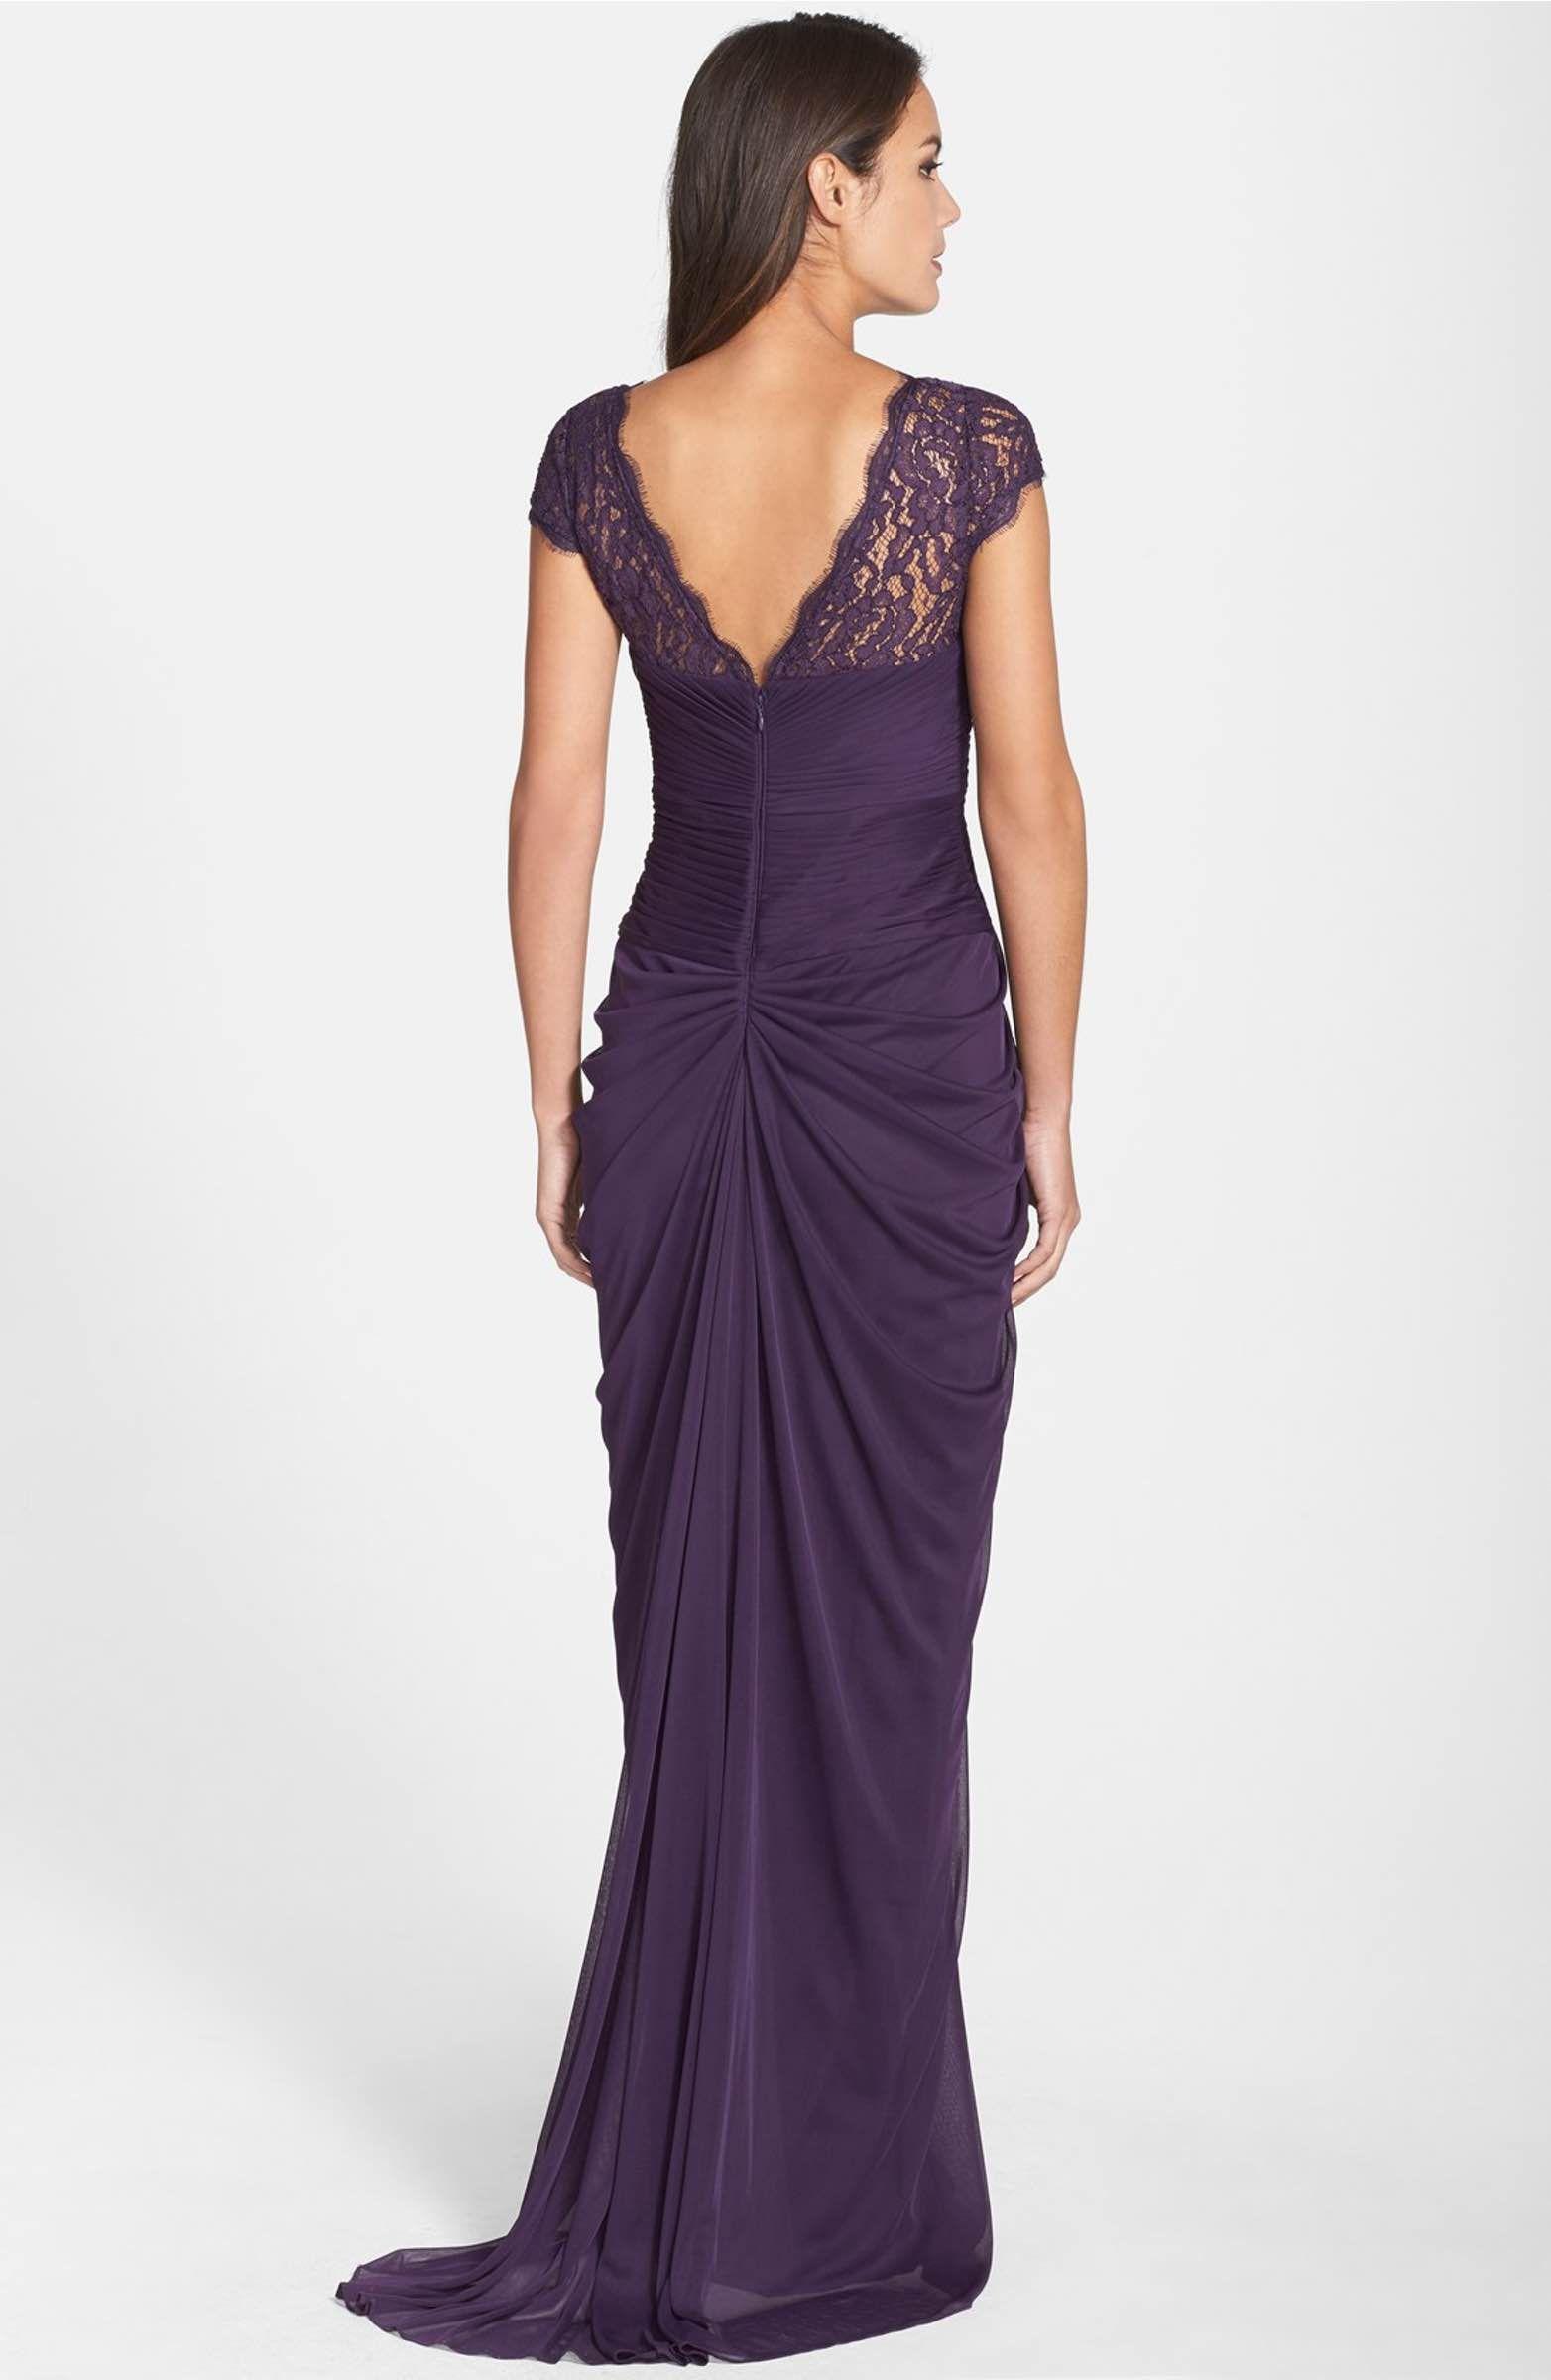 Main Image - Adrianna Papell Lace Yoke Drape Gown   Casamento ...